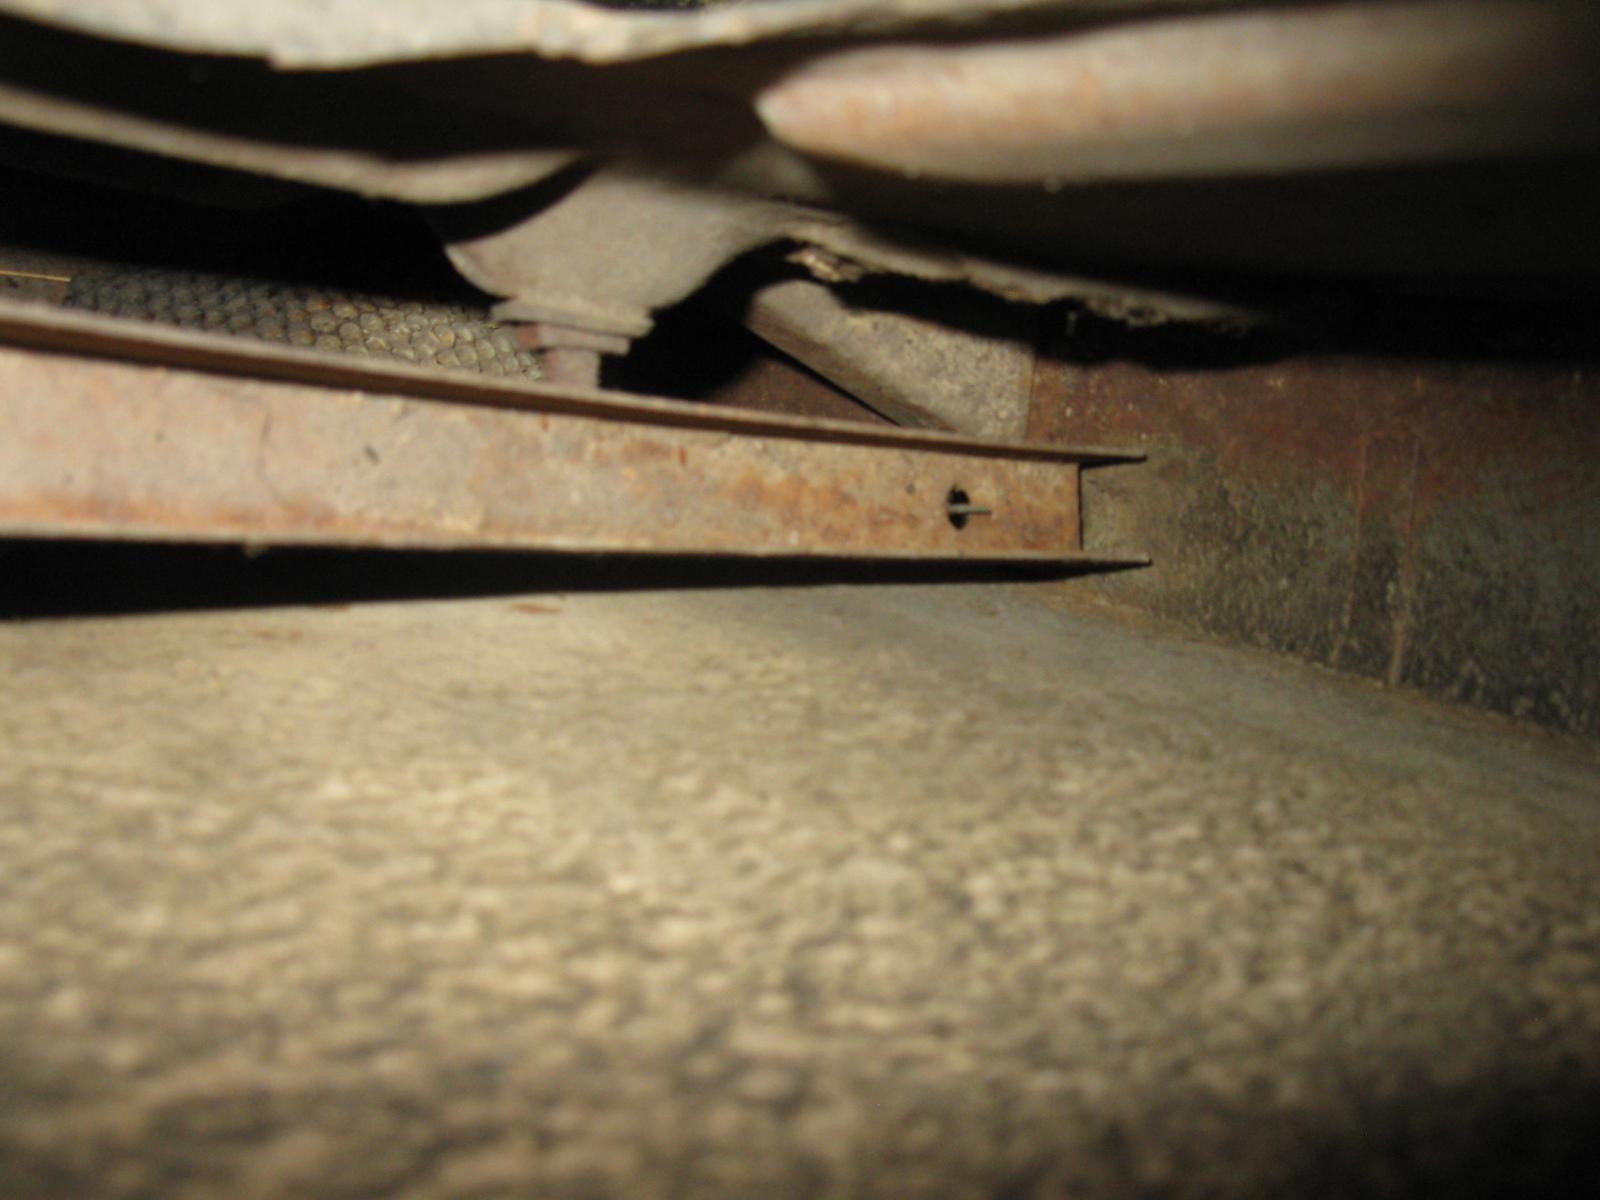 1957 Oval Kabriolett quarter panel moisture drain vents